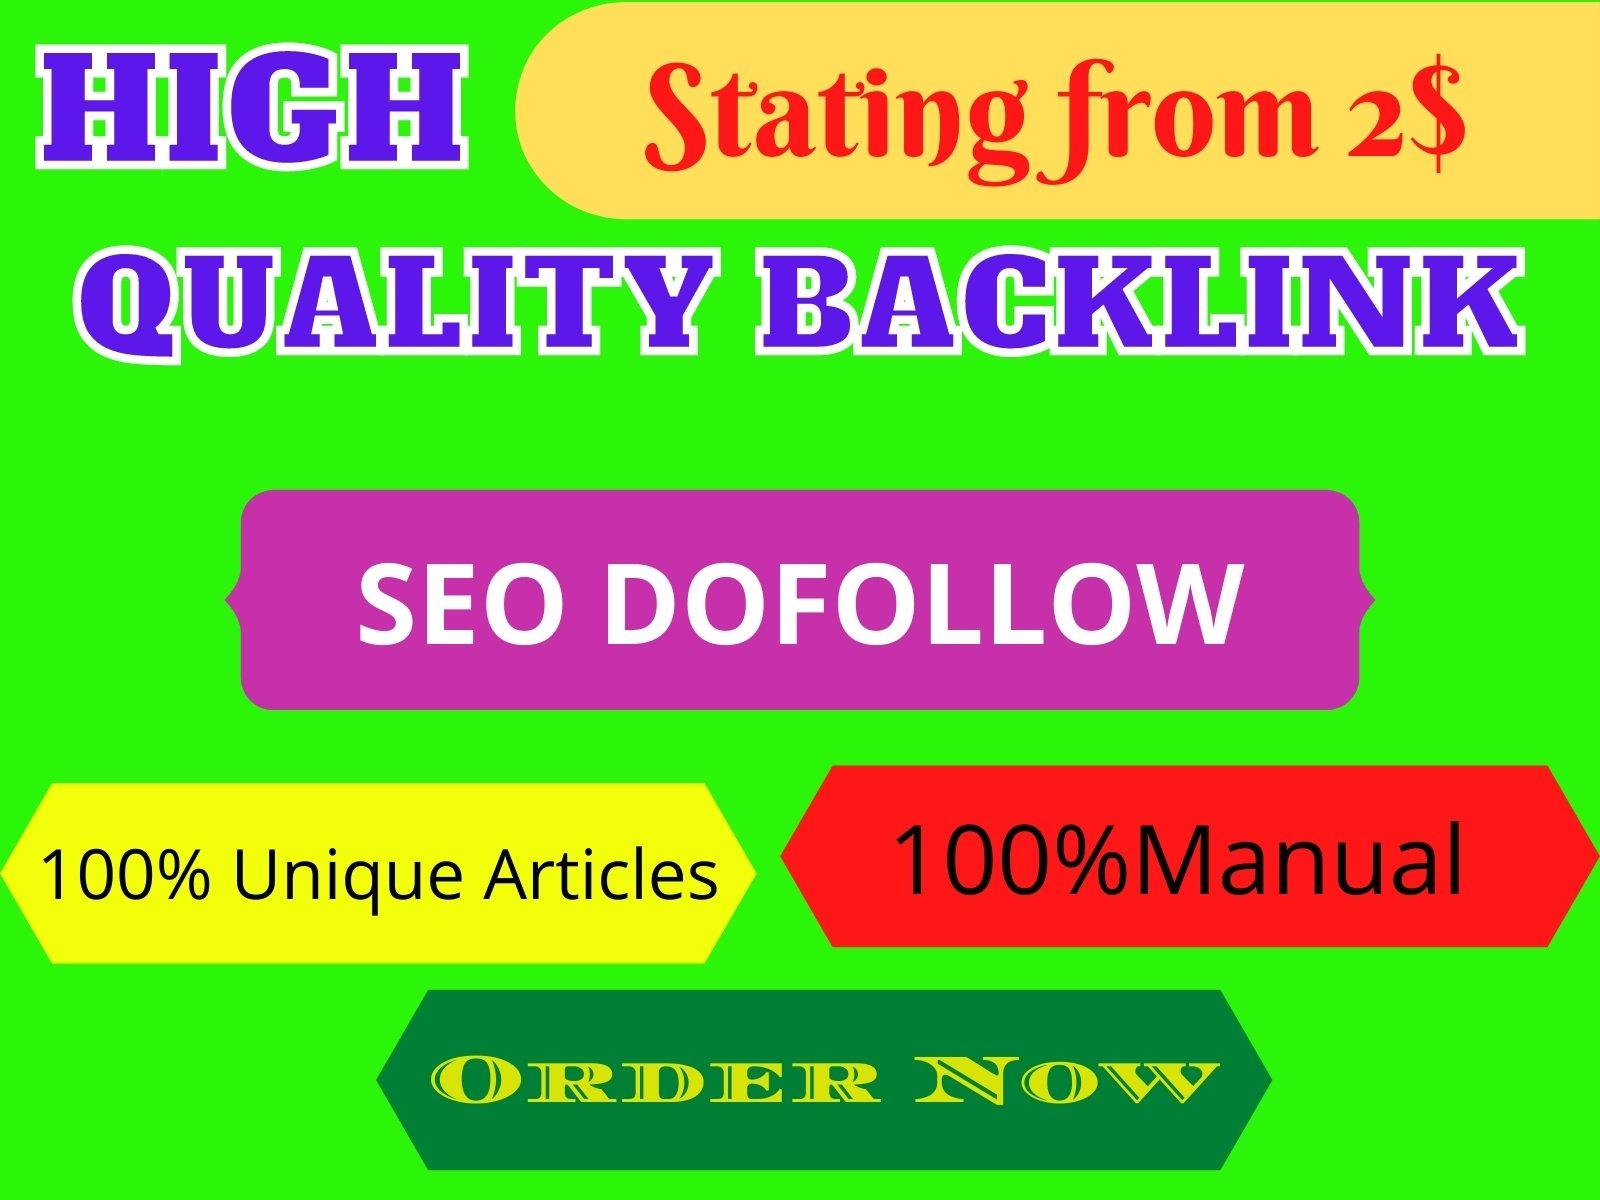 I will create 7 do-follow SEO backlinks